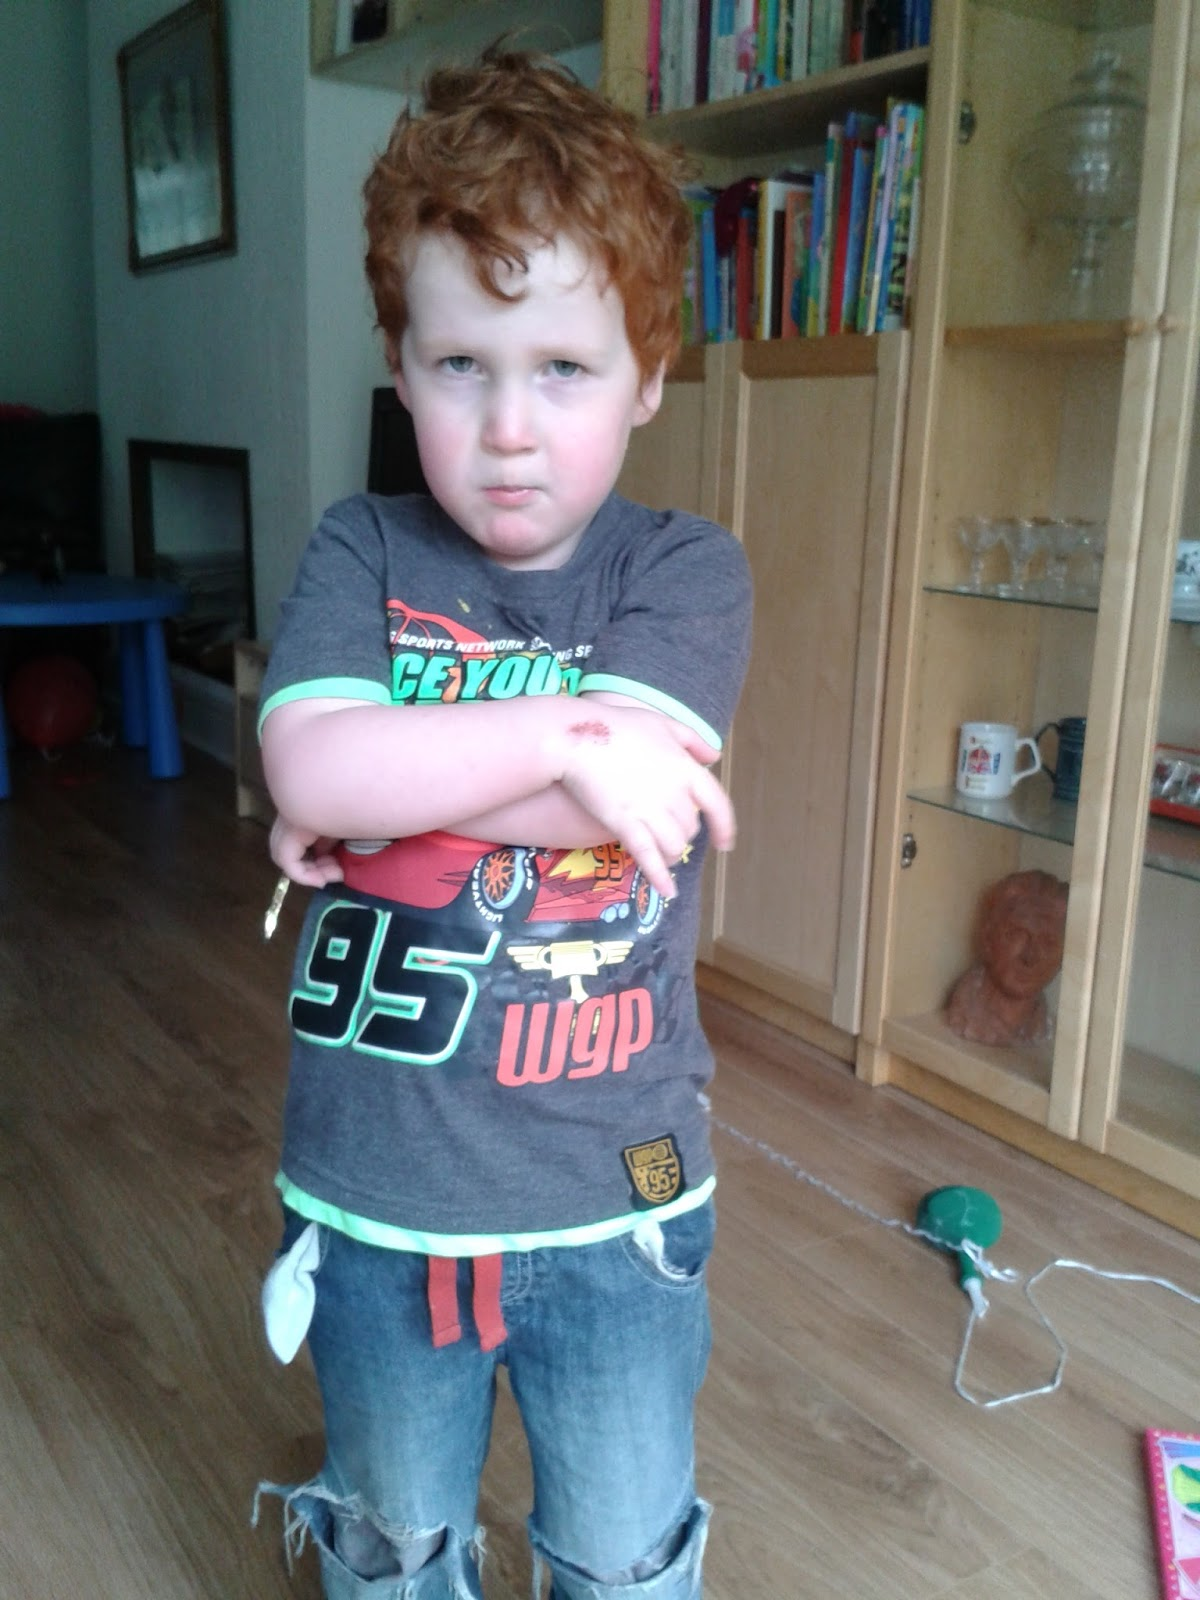 disciplining boys - Ieuan Hobbis and his spooky look